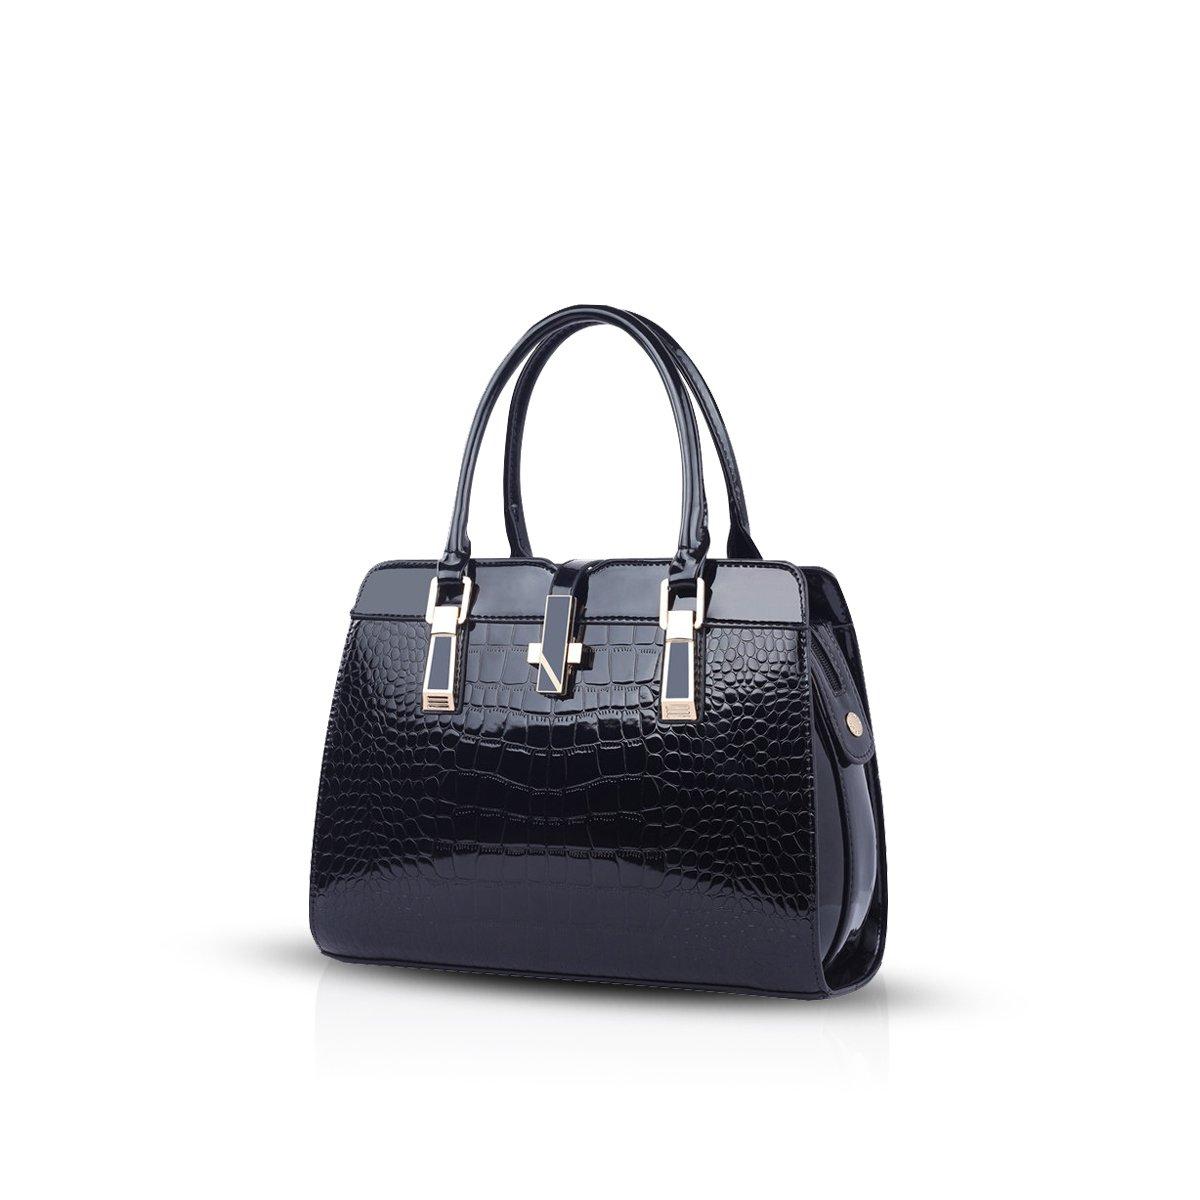 NICOLE&DORIS landies handbags new fashion patent leather shell portable shoulder Messenger bag for women(Black)